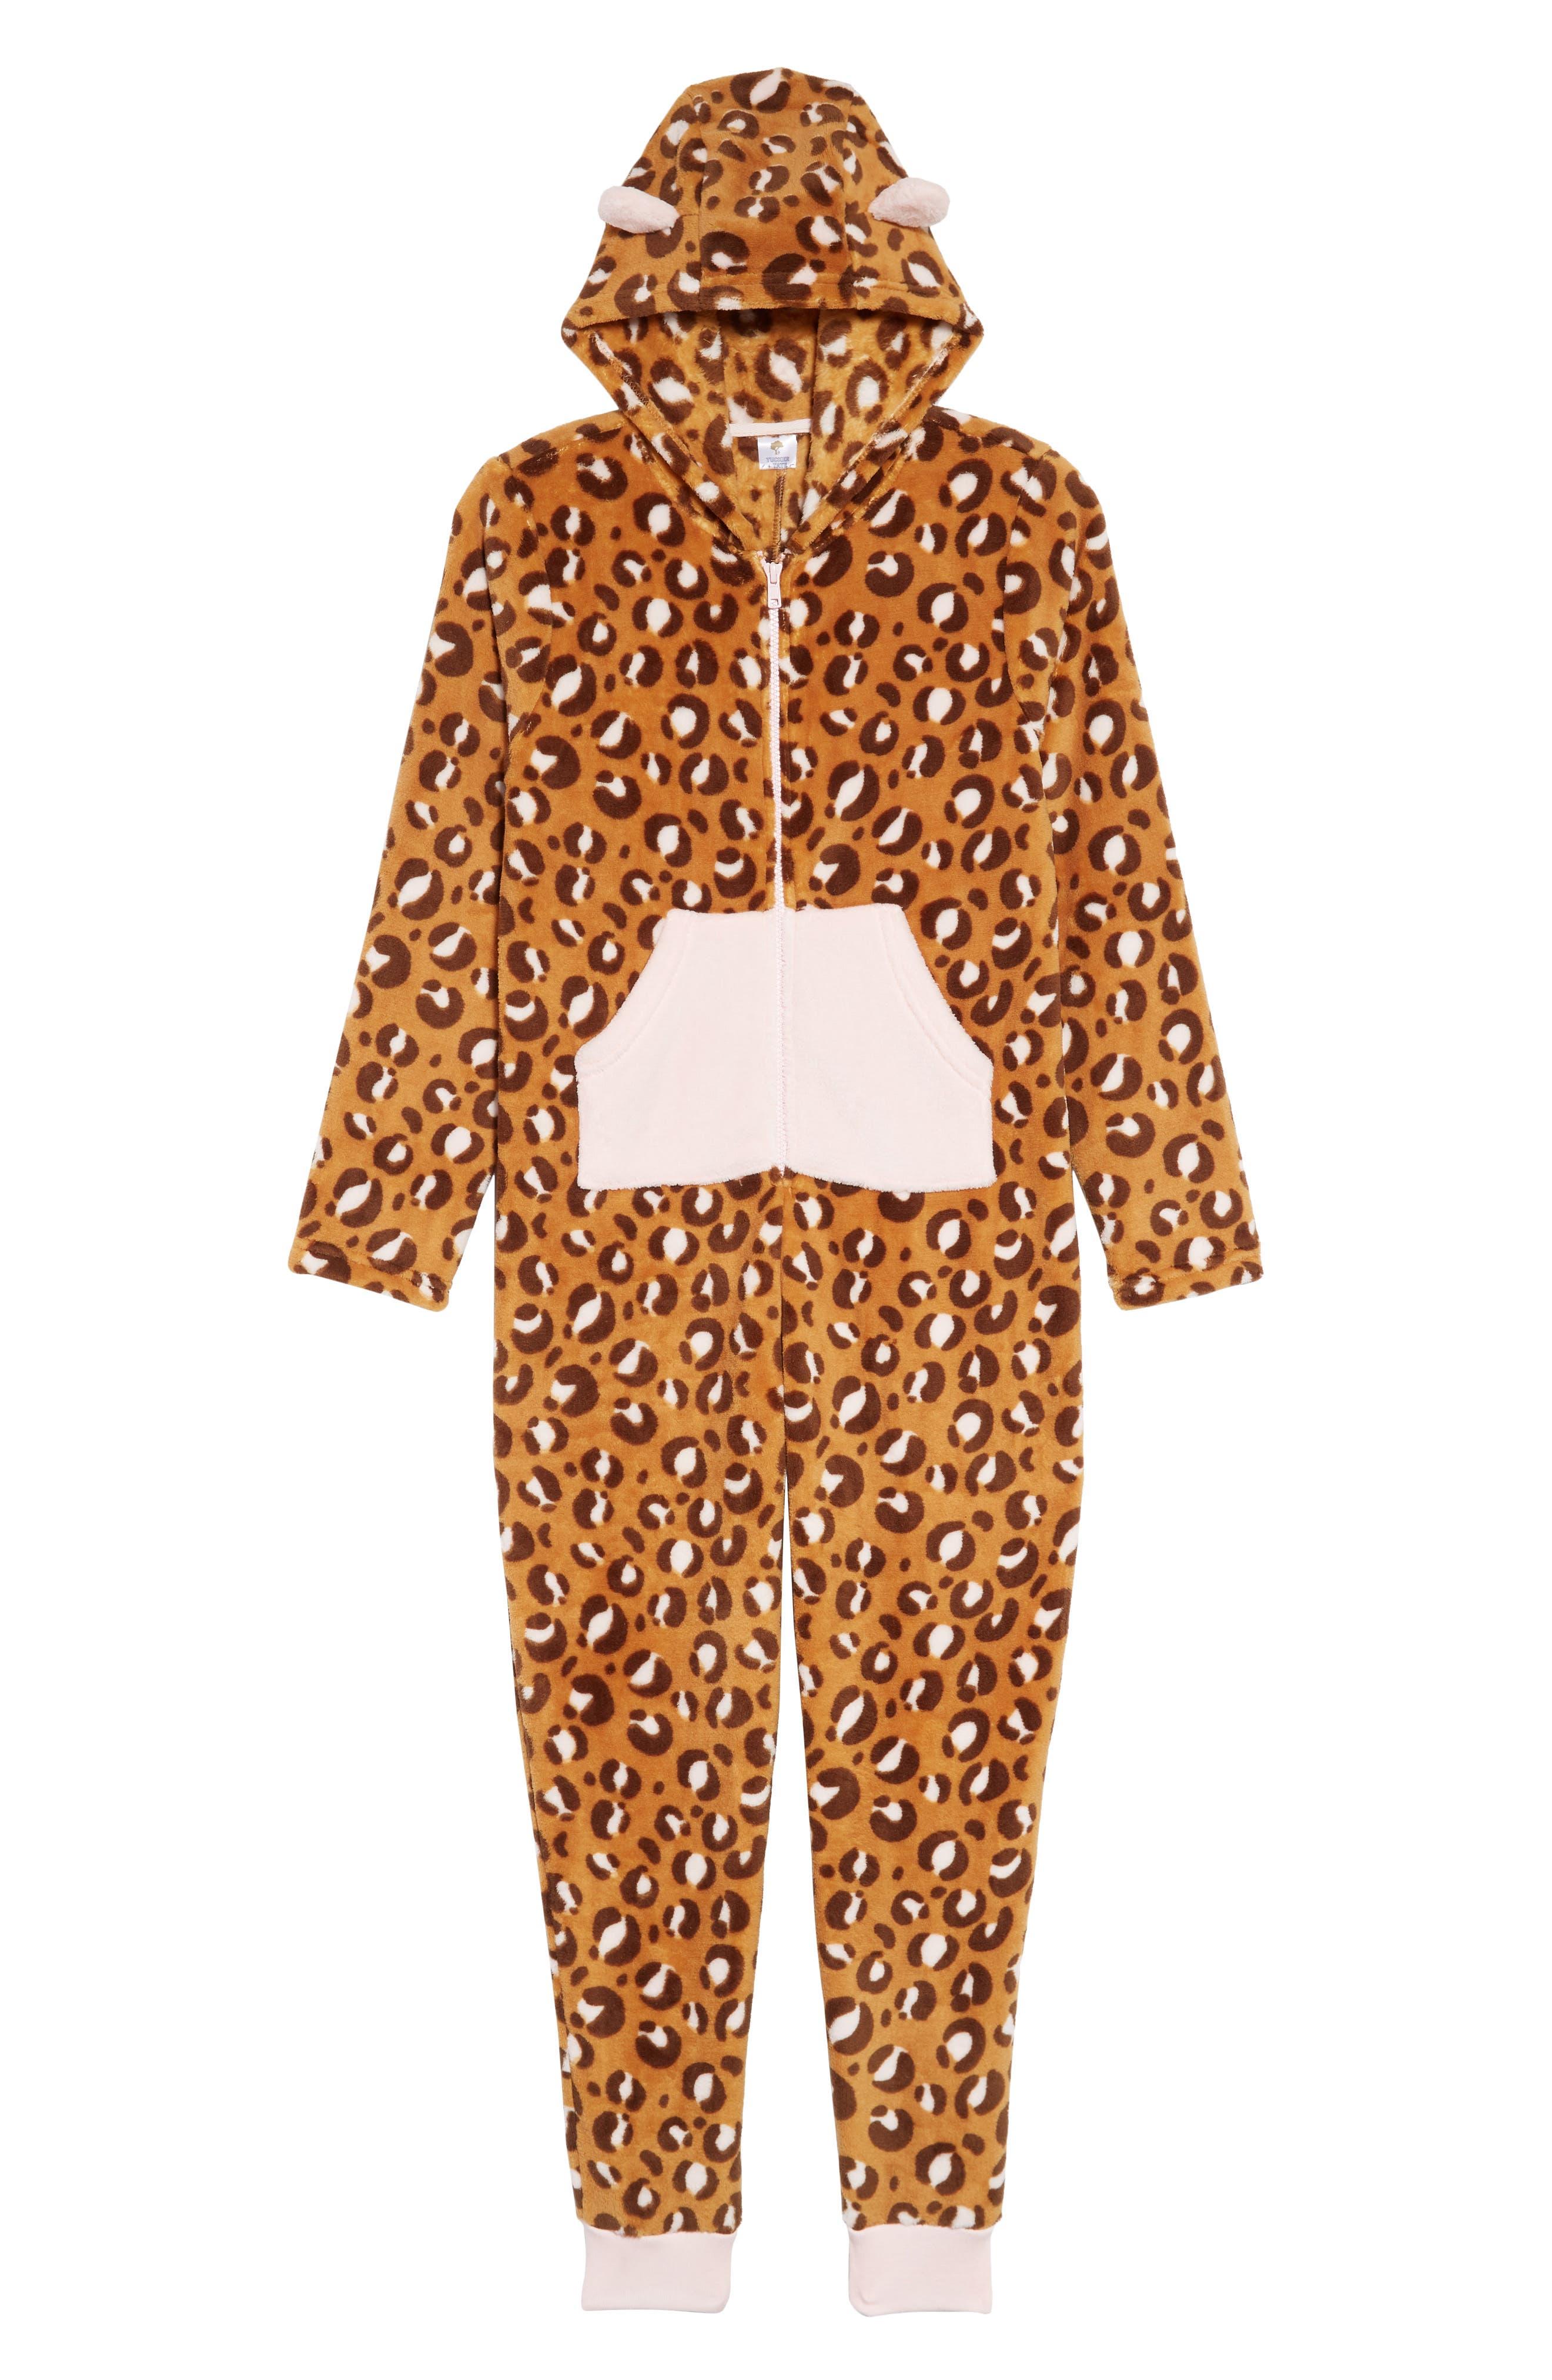 TUCKER + TATE One-Piece Pajamas, Main, color, TAN DALE PUNK CHEETAH